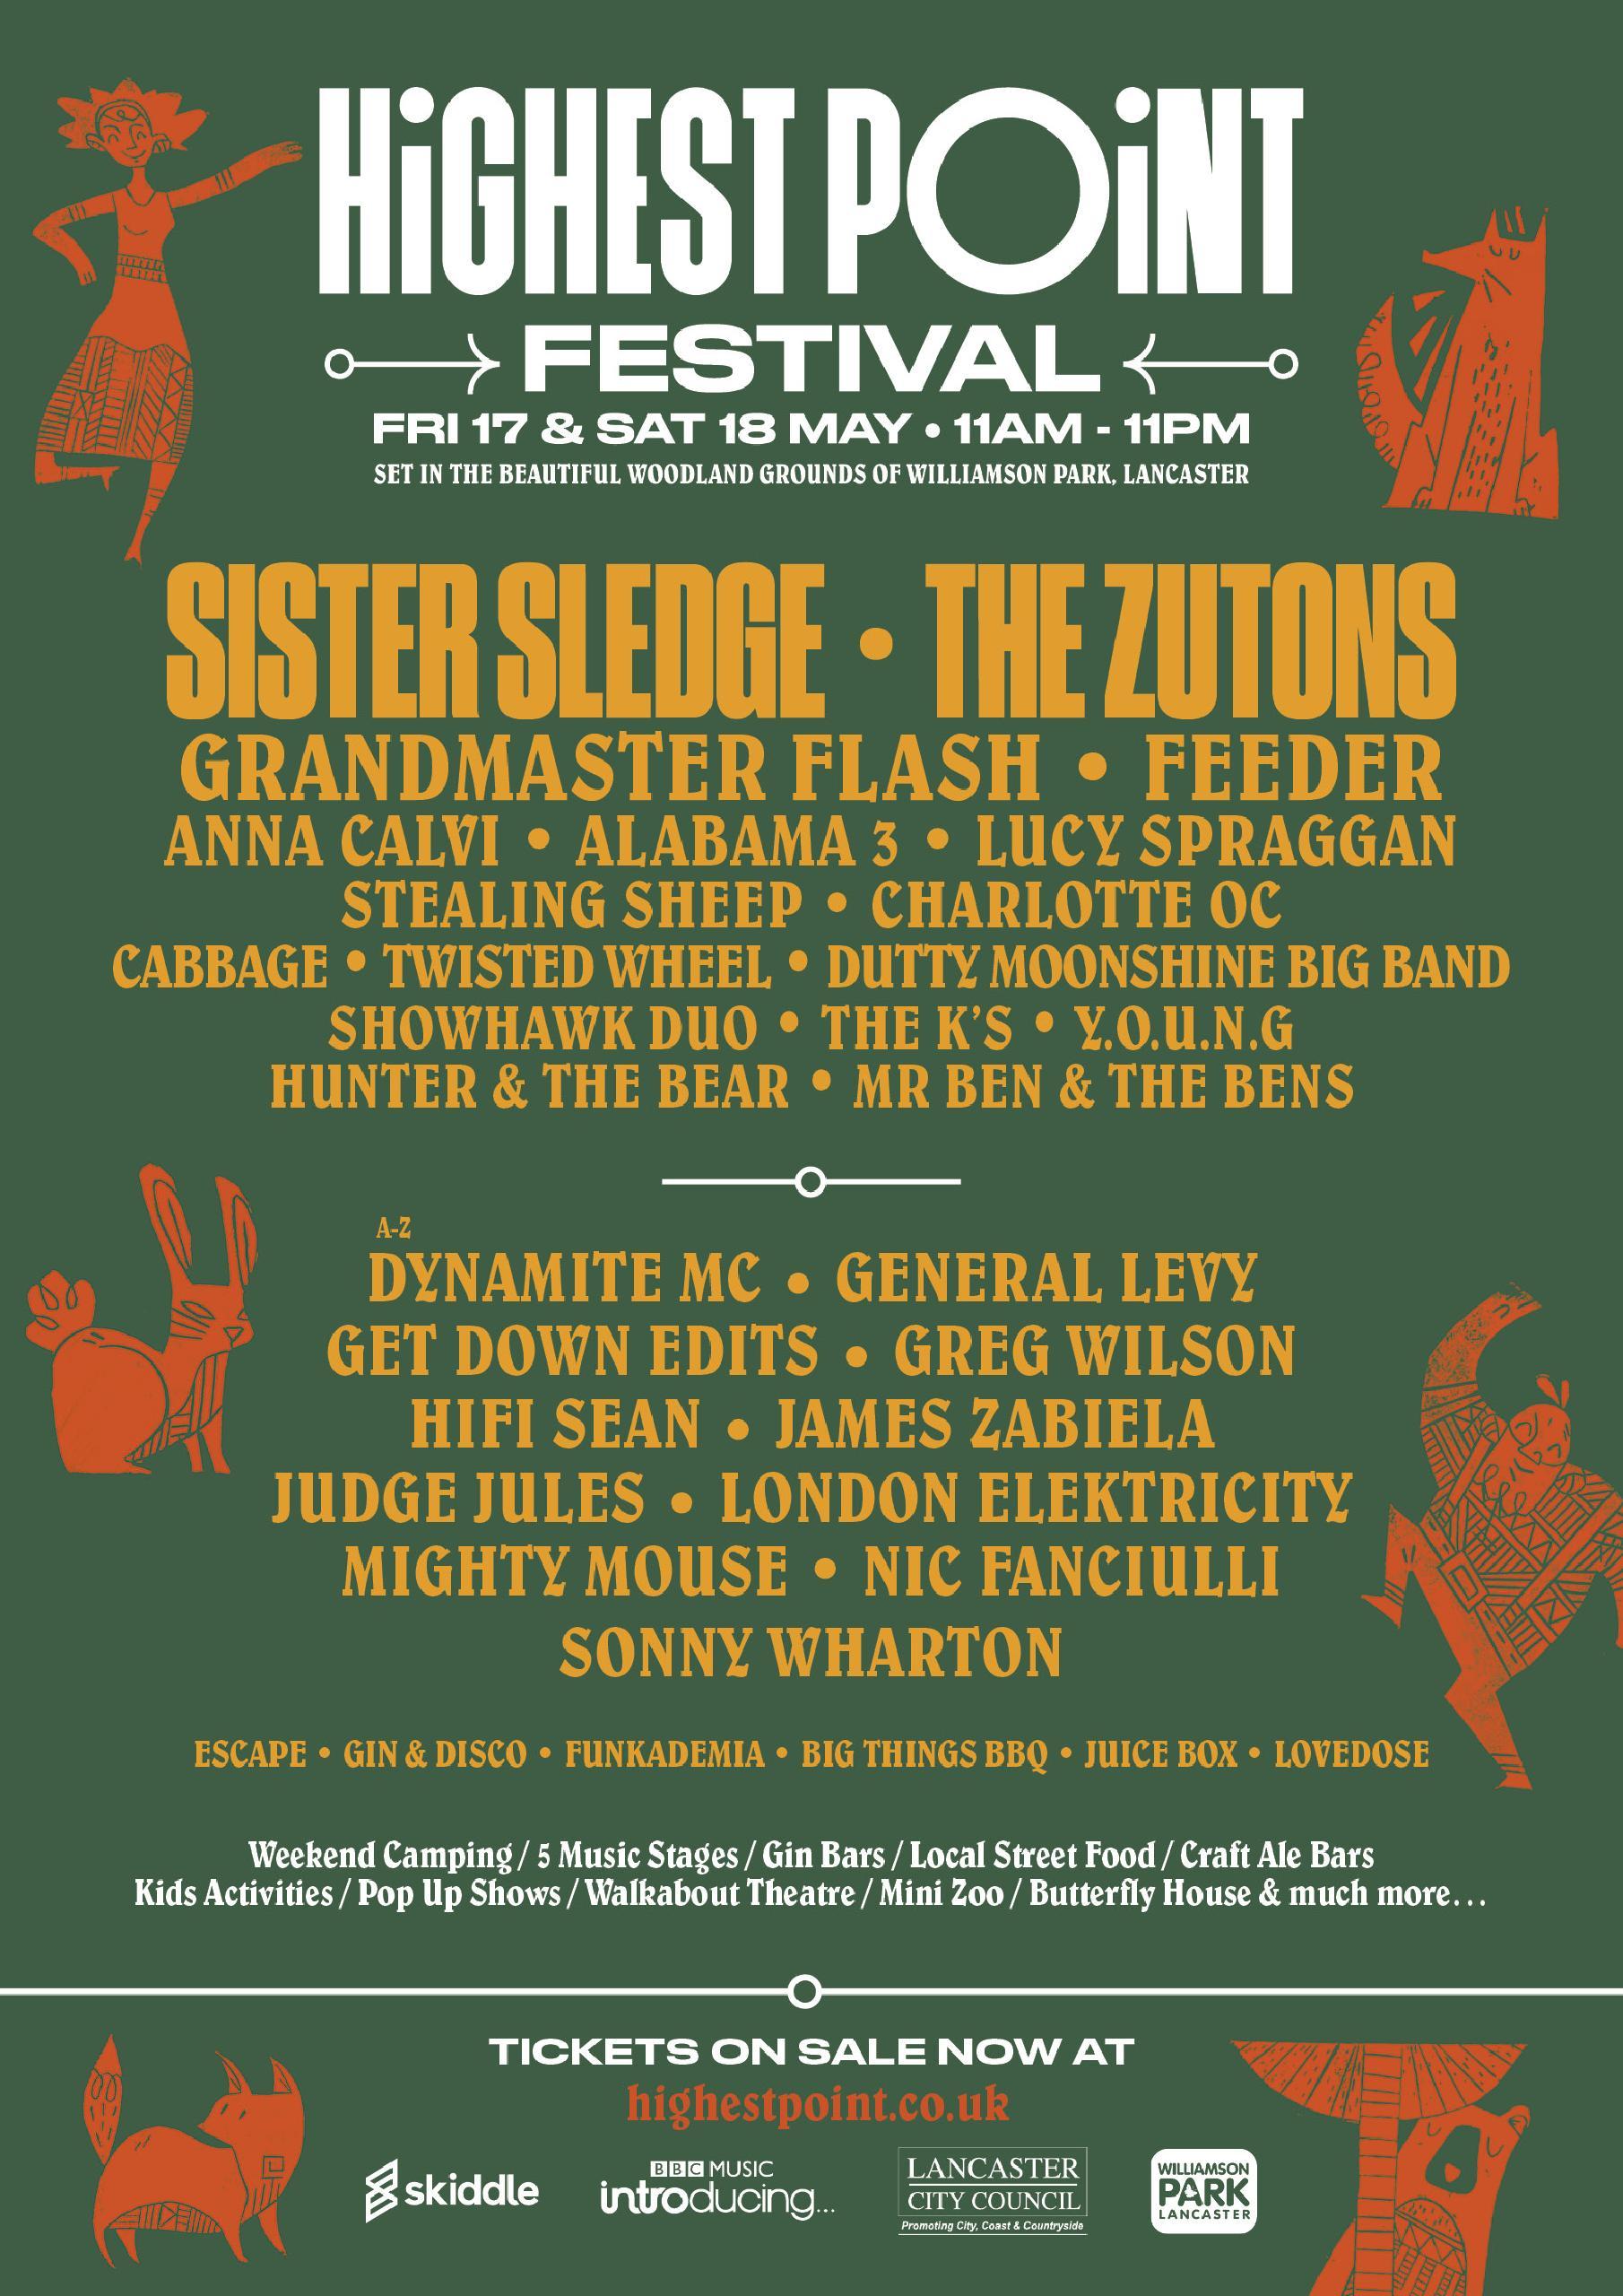 Highest Point Festival Lineup